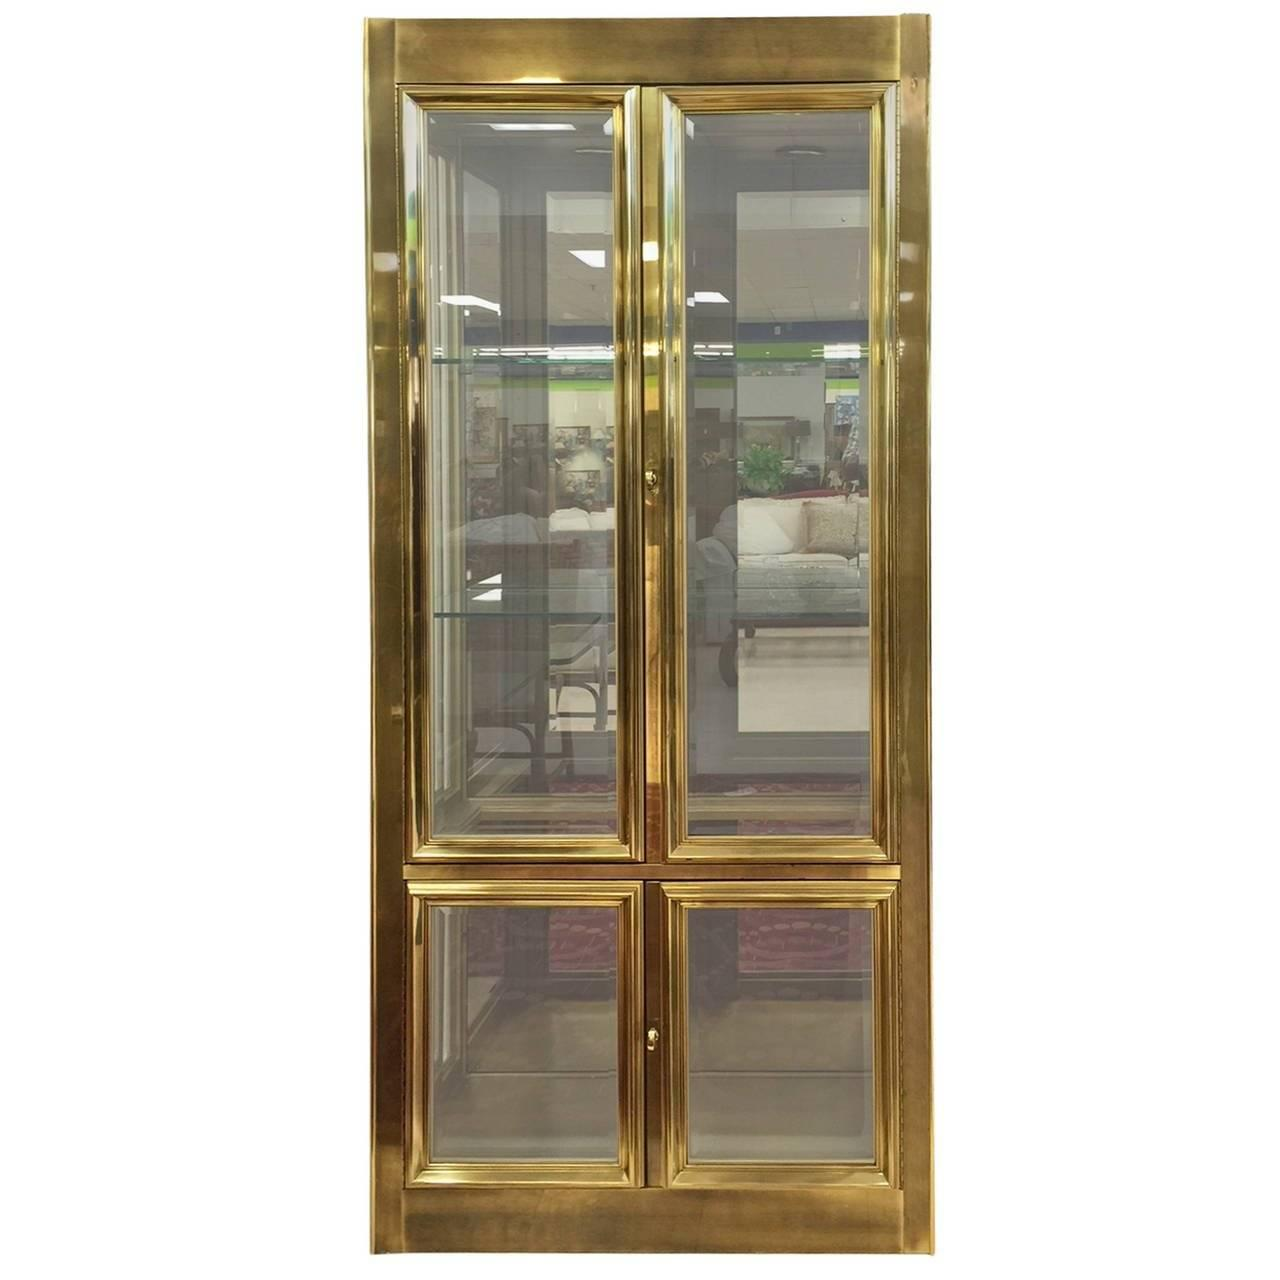 mastercraft brass vitrine display cabinet for sale at 1stdibs